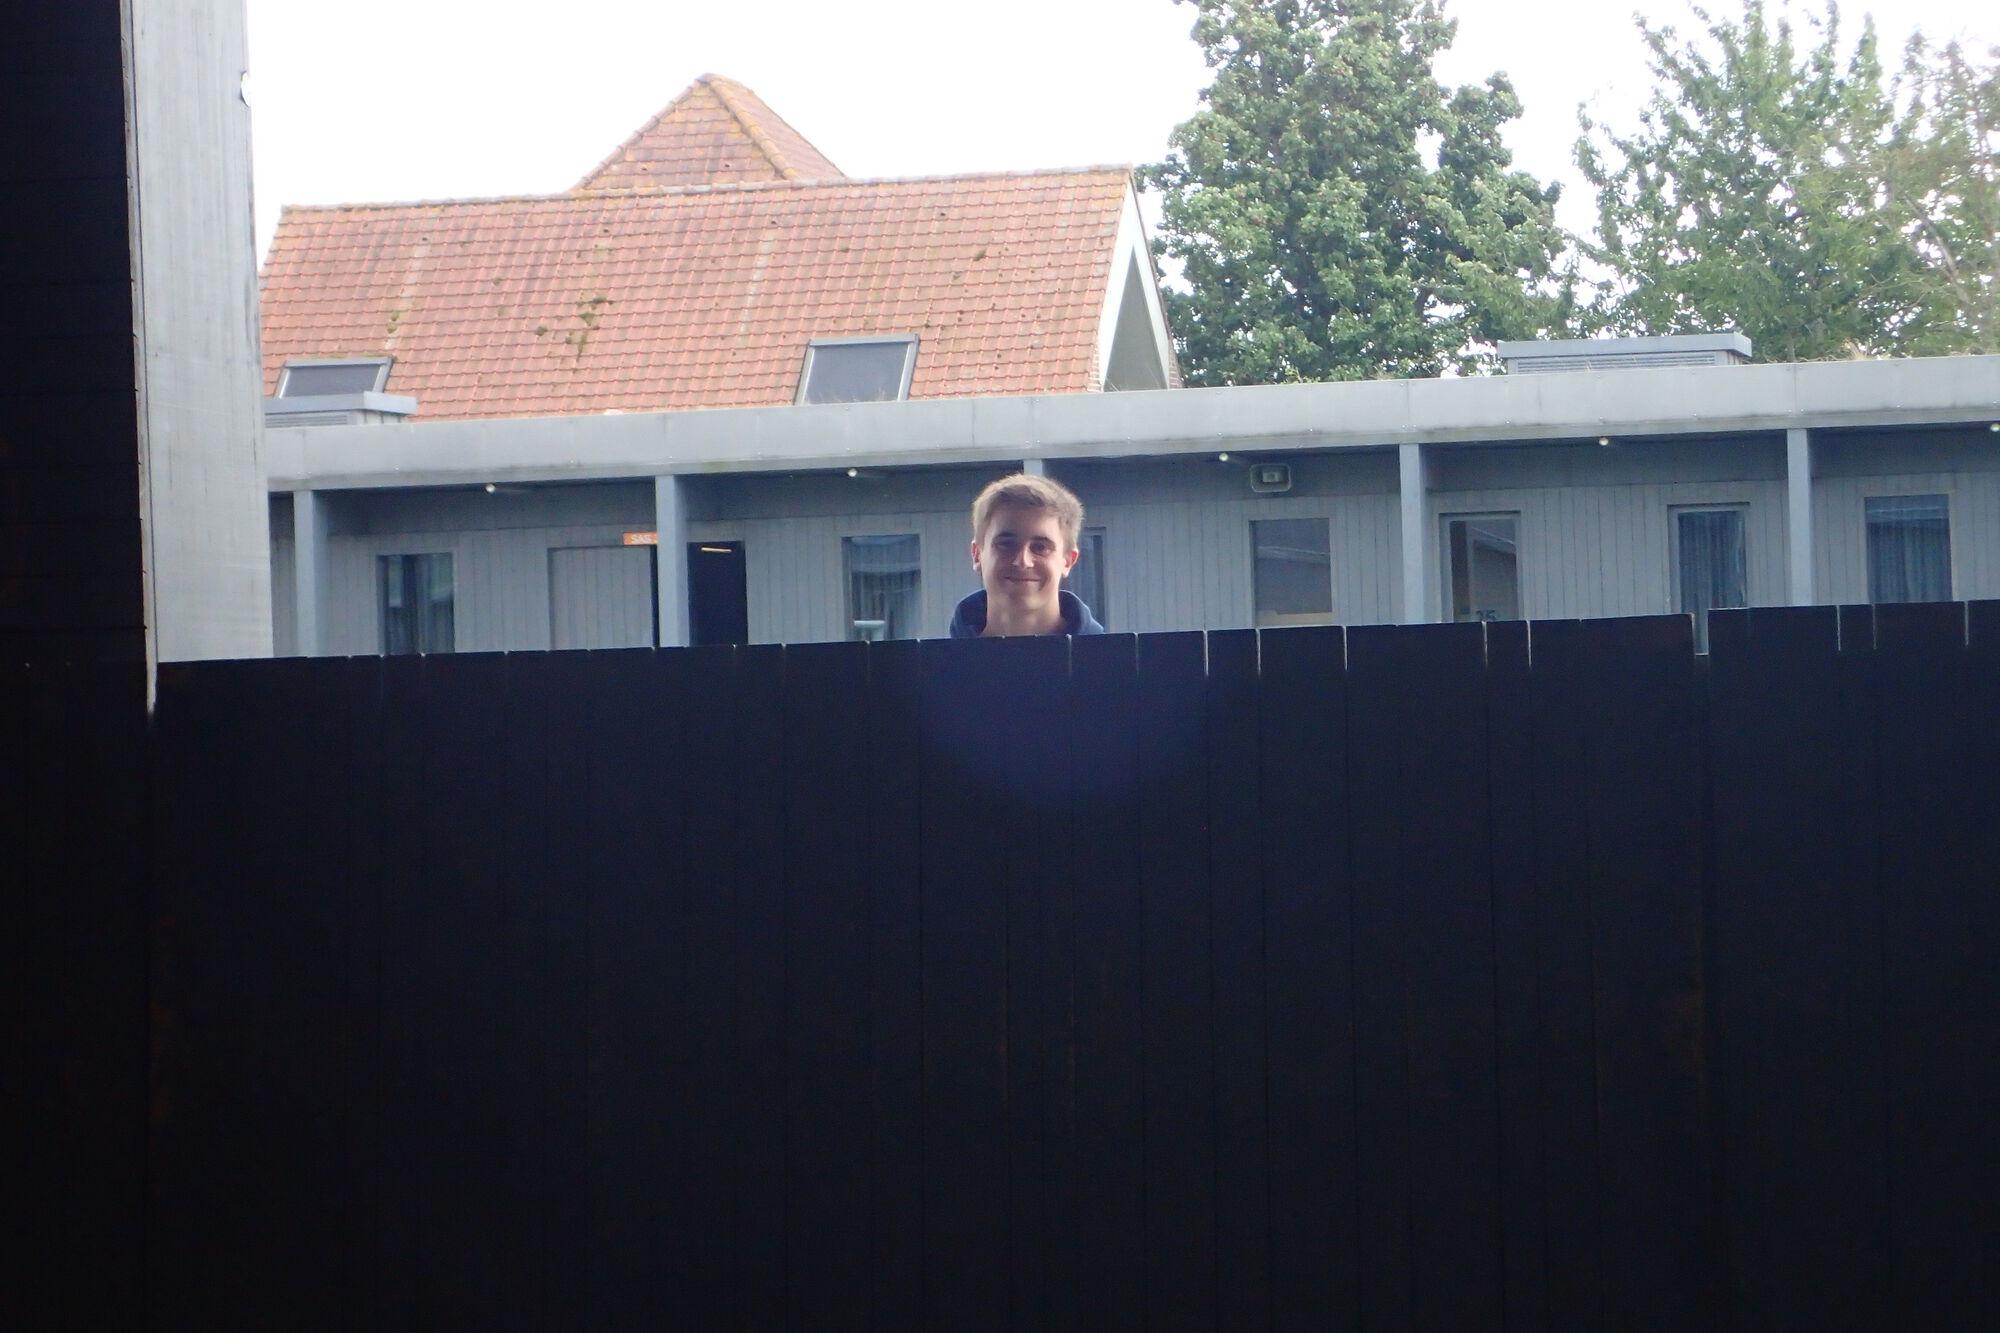 200713 - Sportkamp zomer week 29 - De Boerekreek